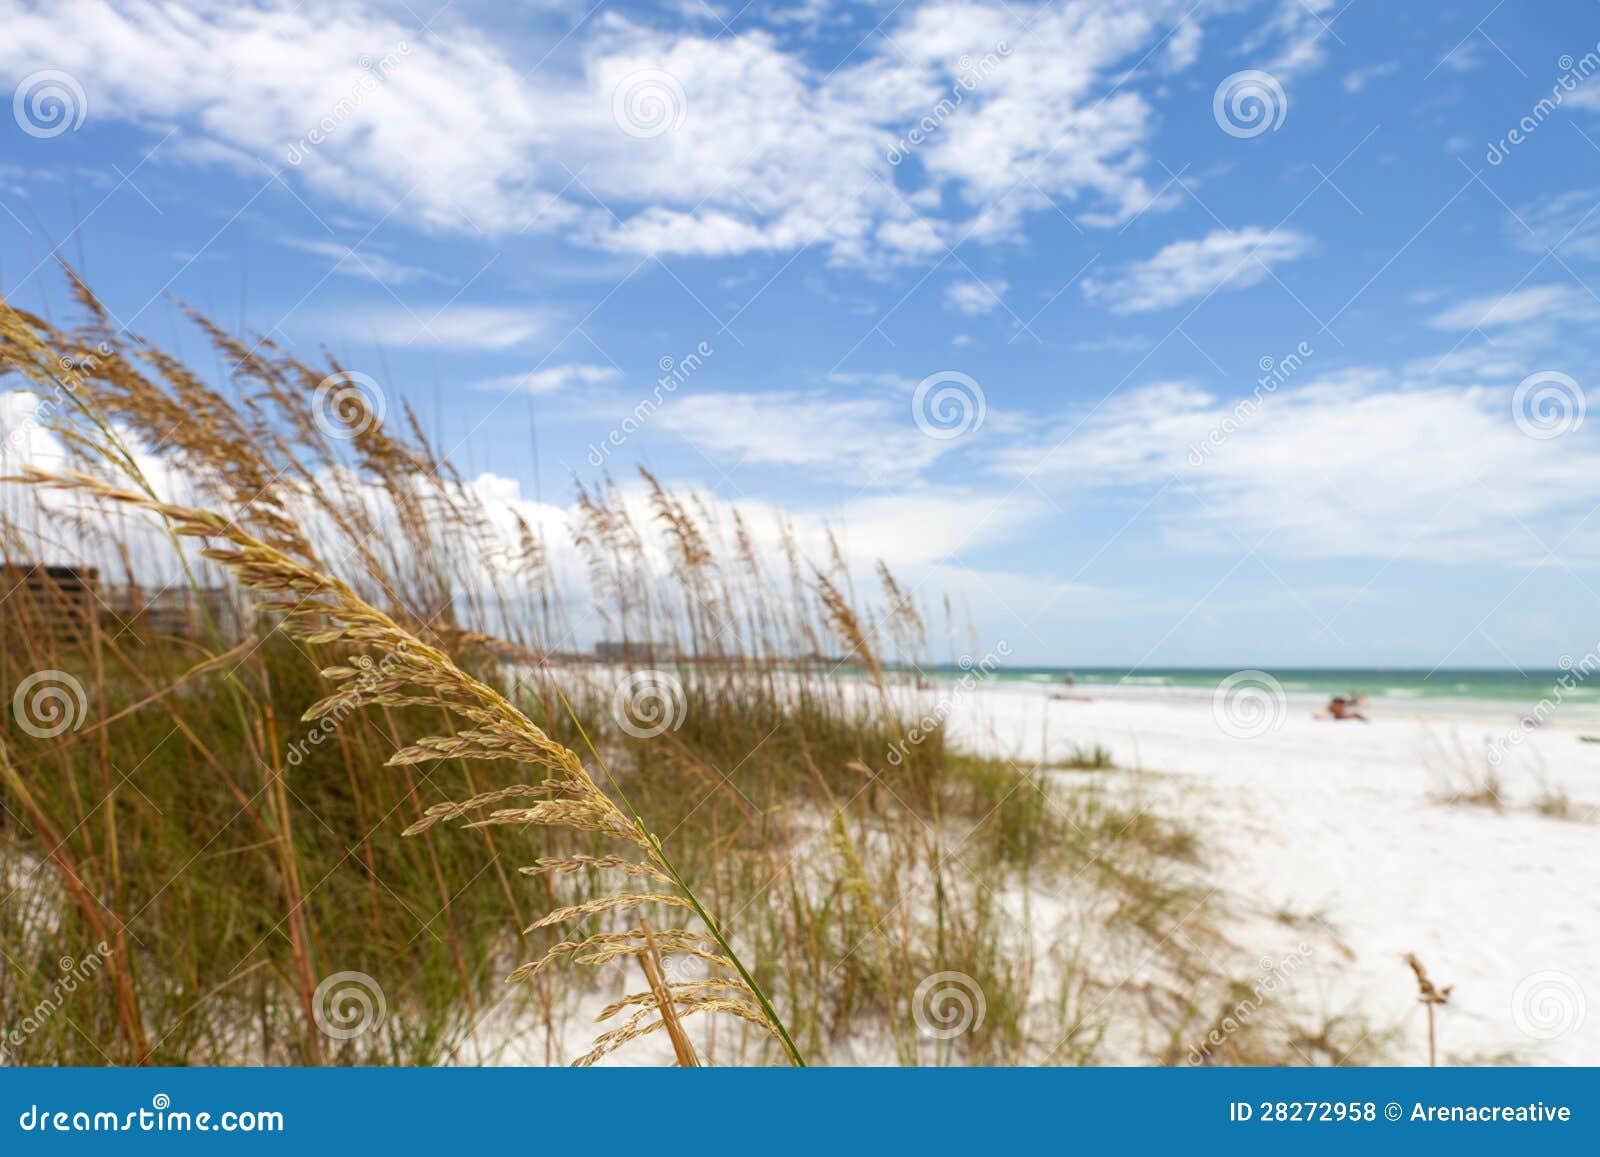 Siesta Key Beach Sarasota Florida Royalty Free Stock